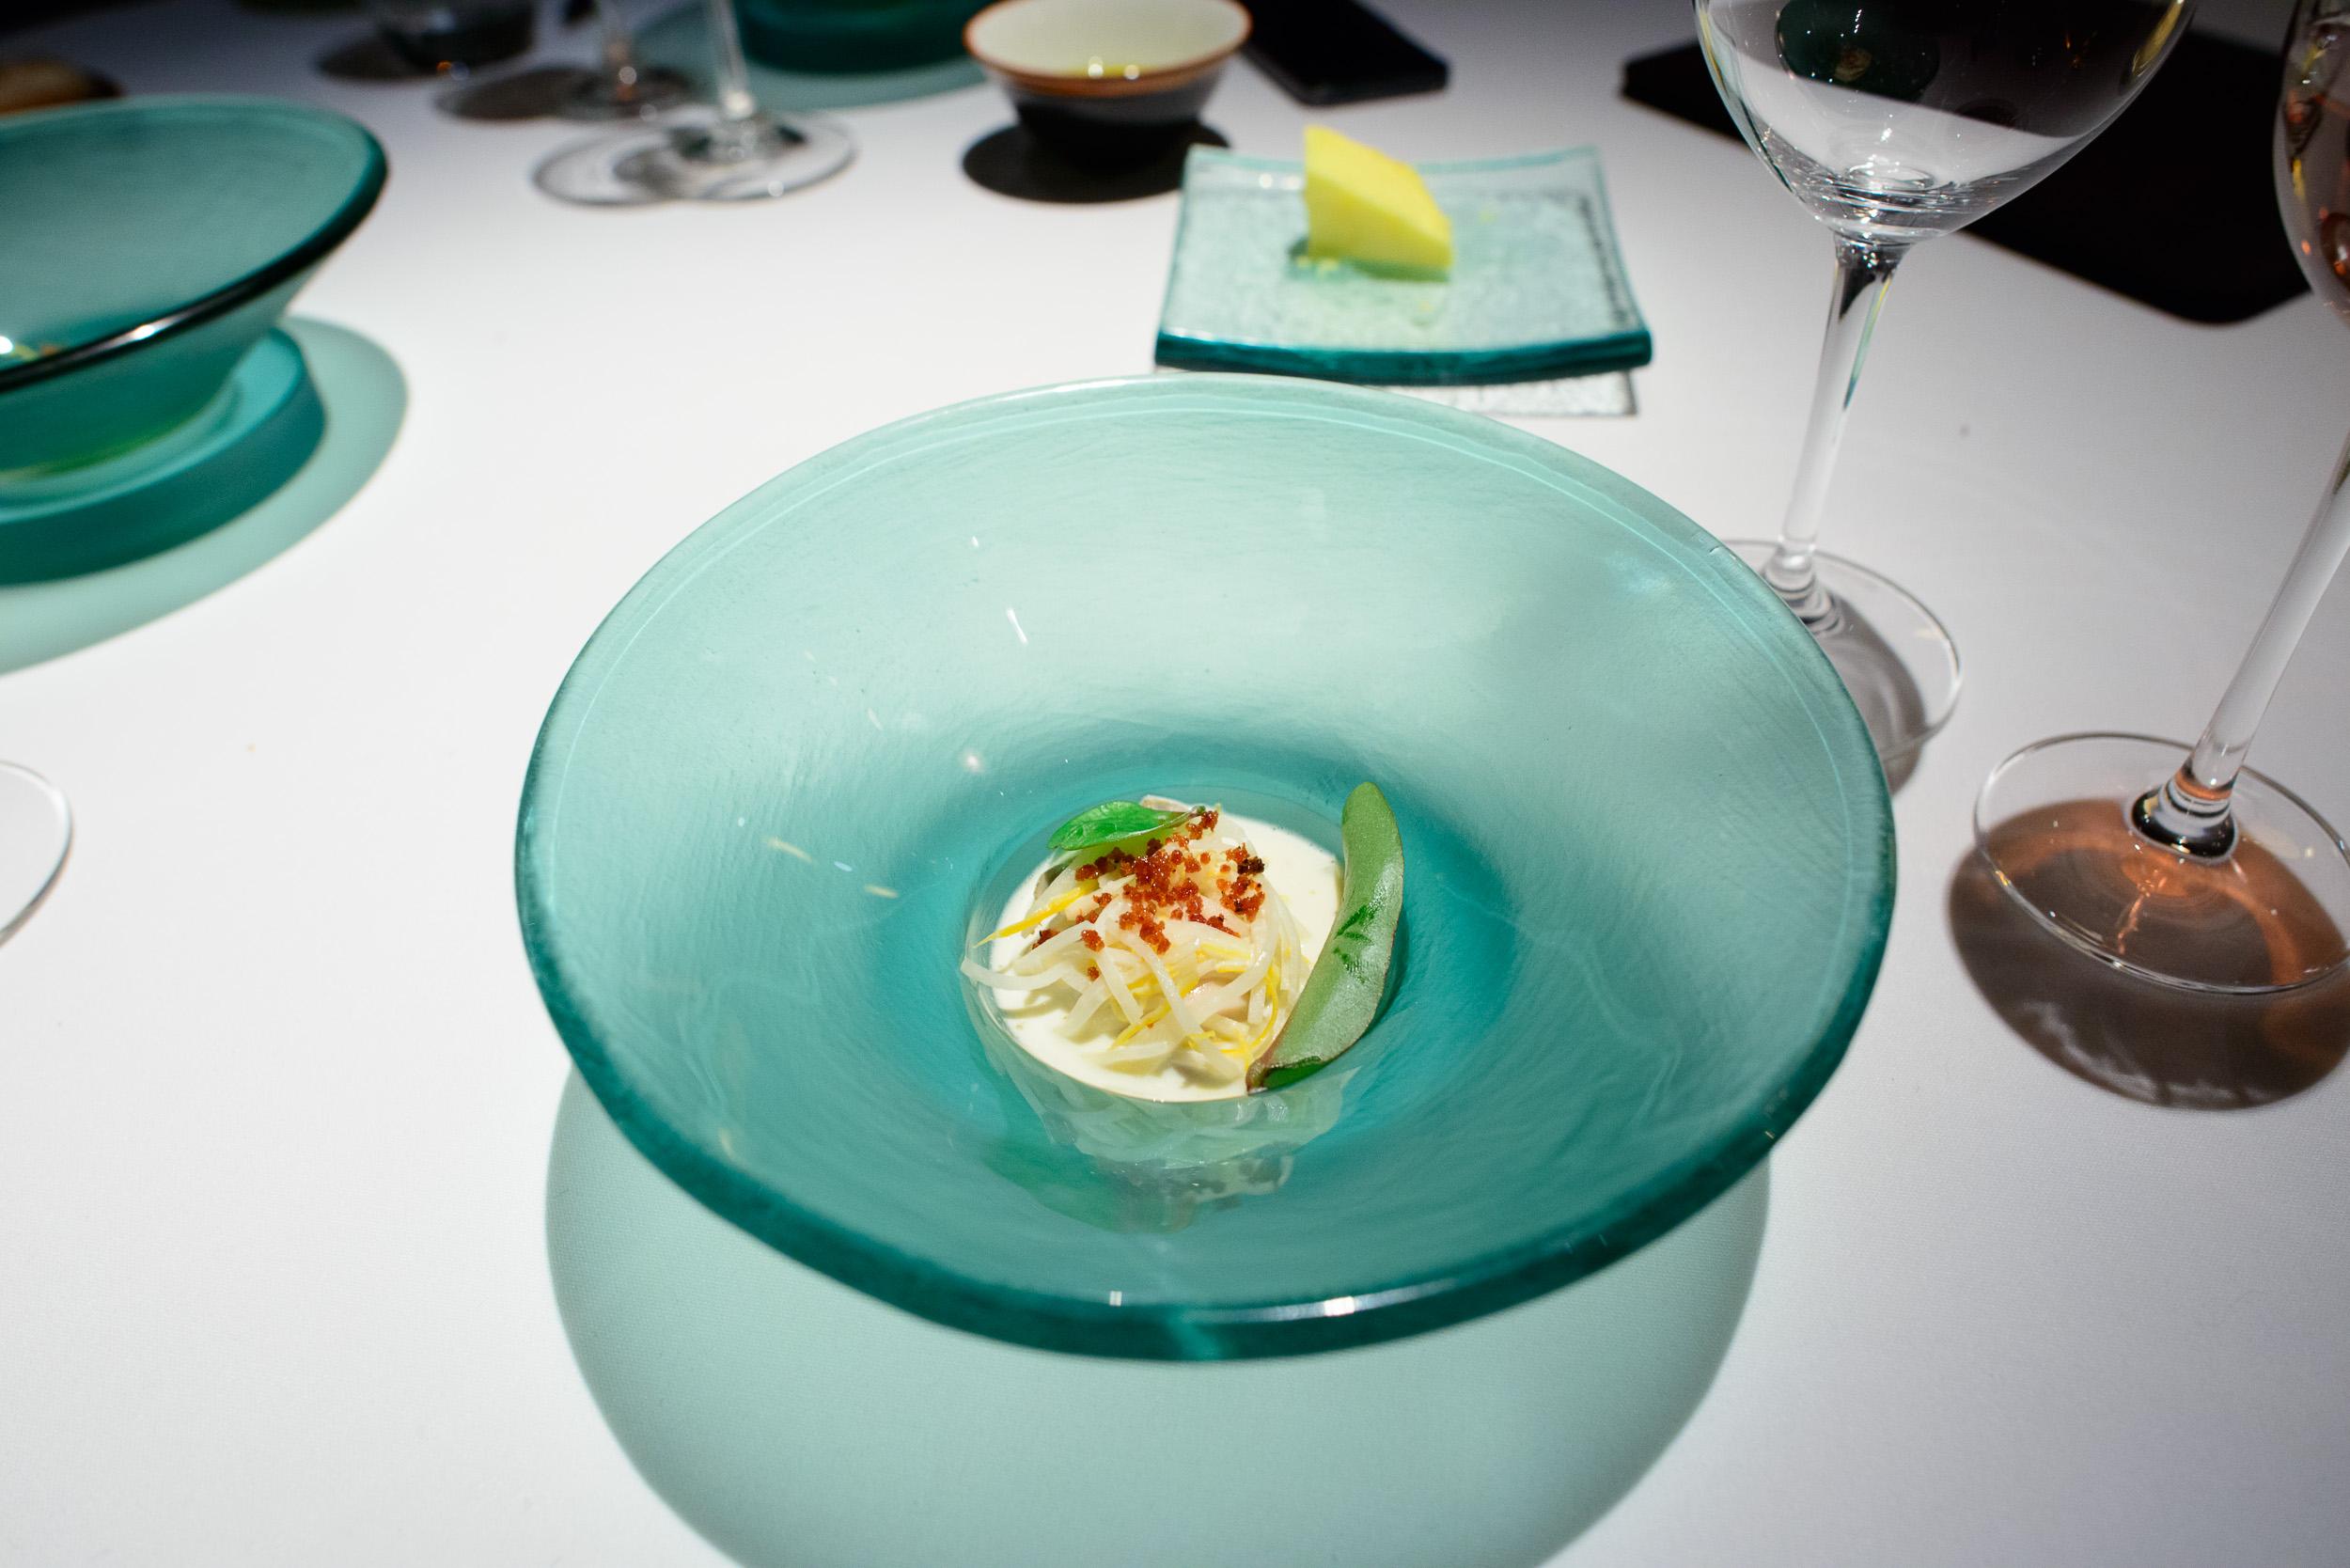 10th Course: Oyster, kolhrabi cream, pancetta